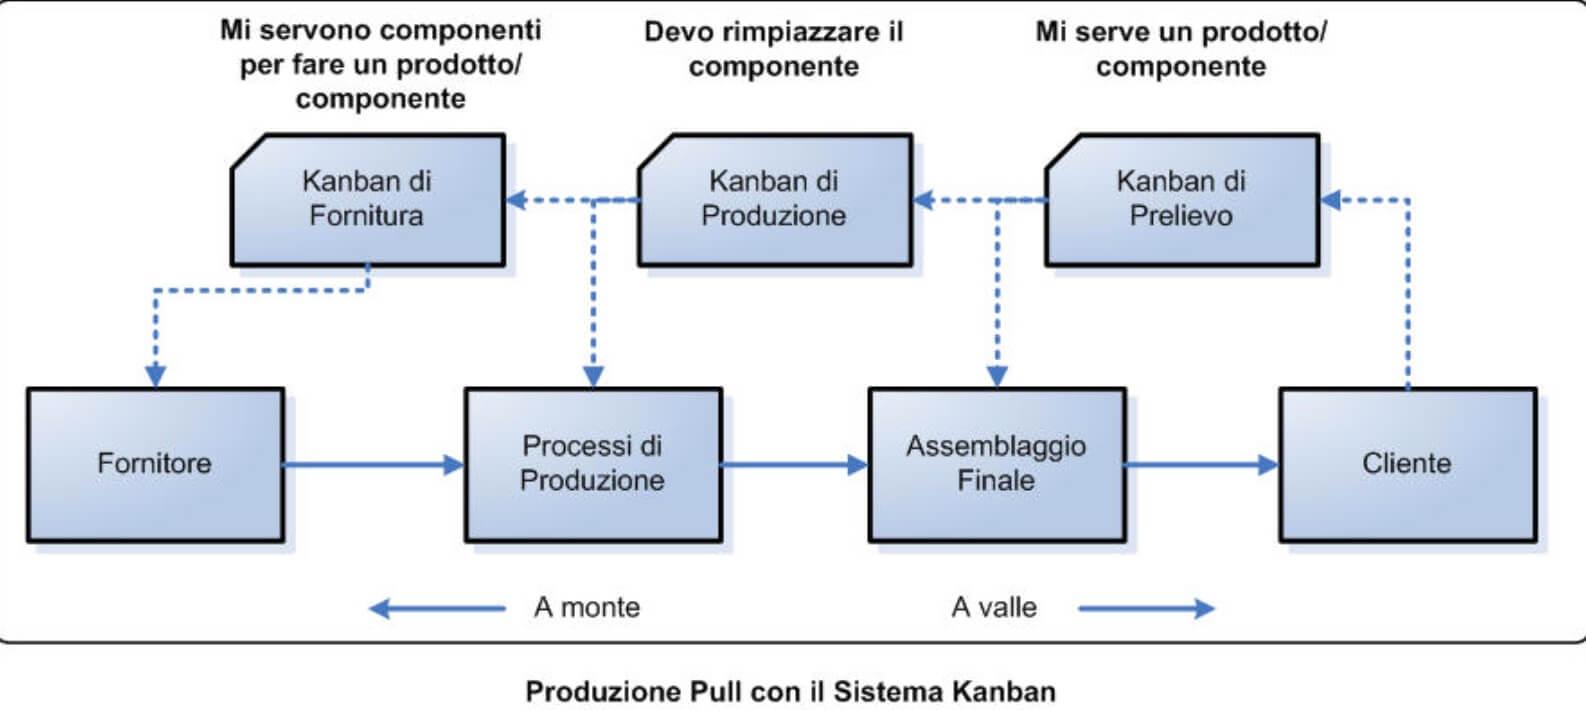 kanban2Il metodo Kanban: un esempio per capirlo meglio